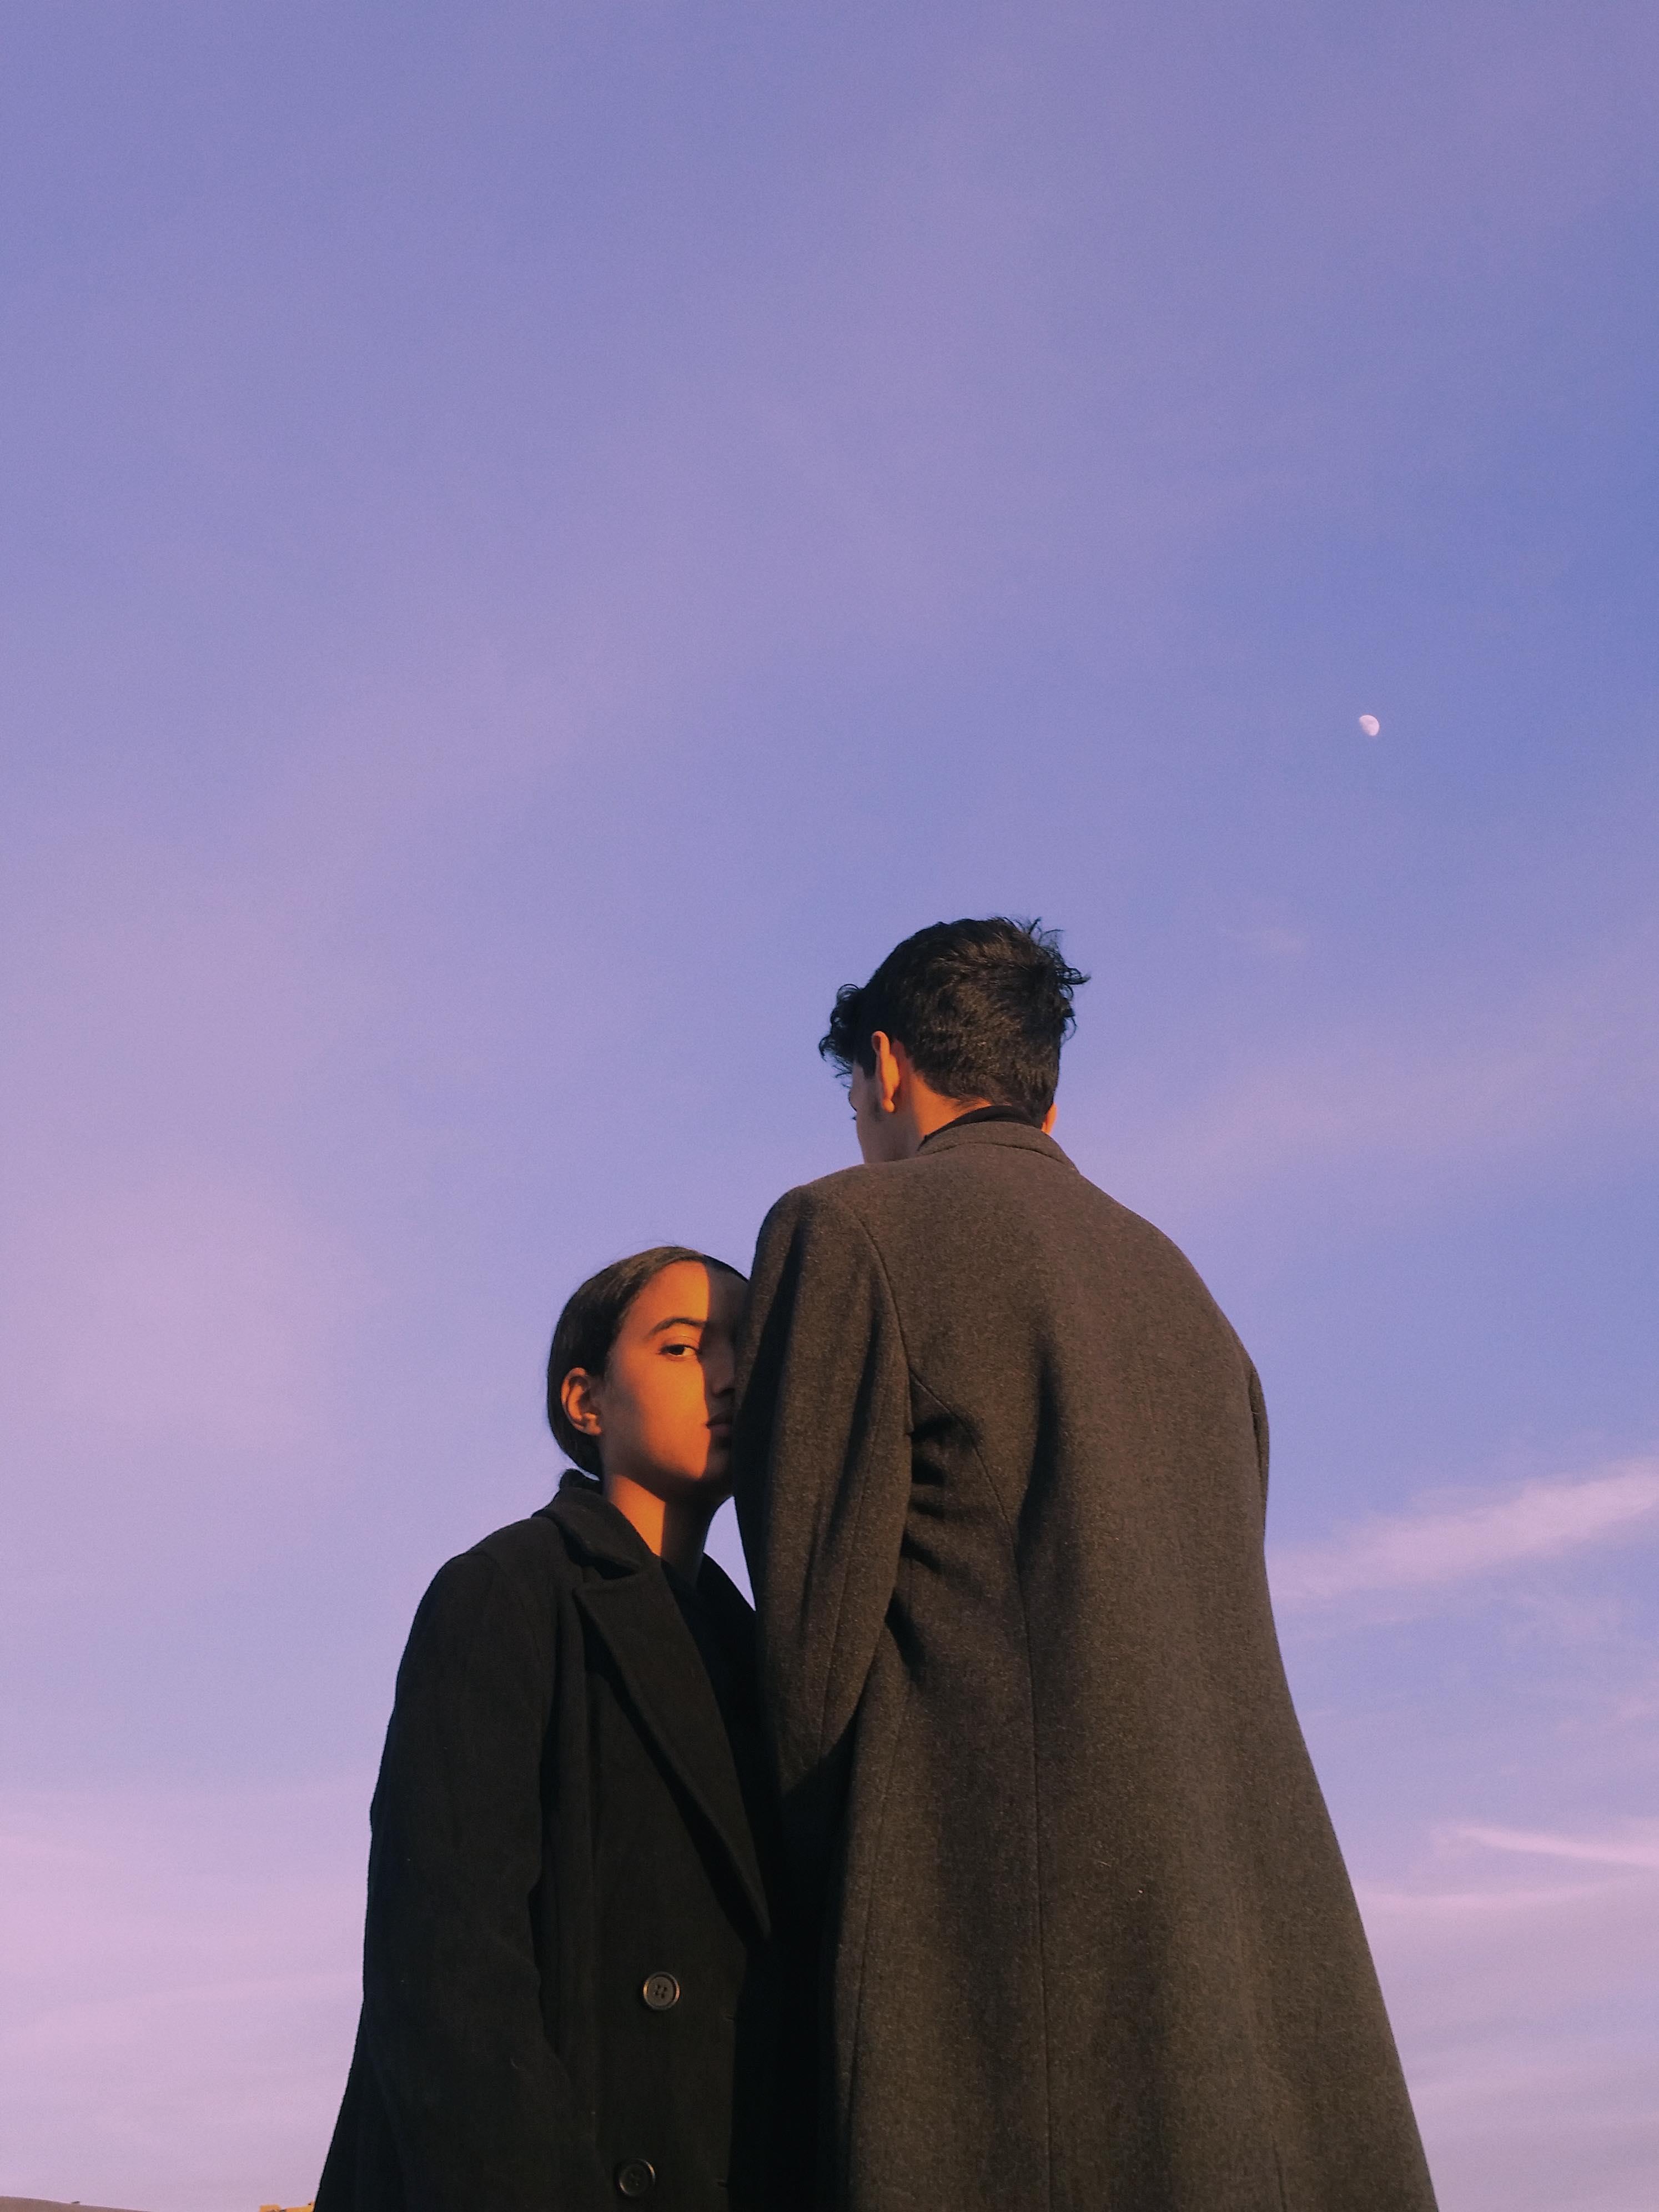 Though the lens of Photographer Ismail Zaïdi